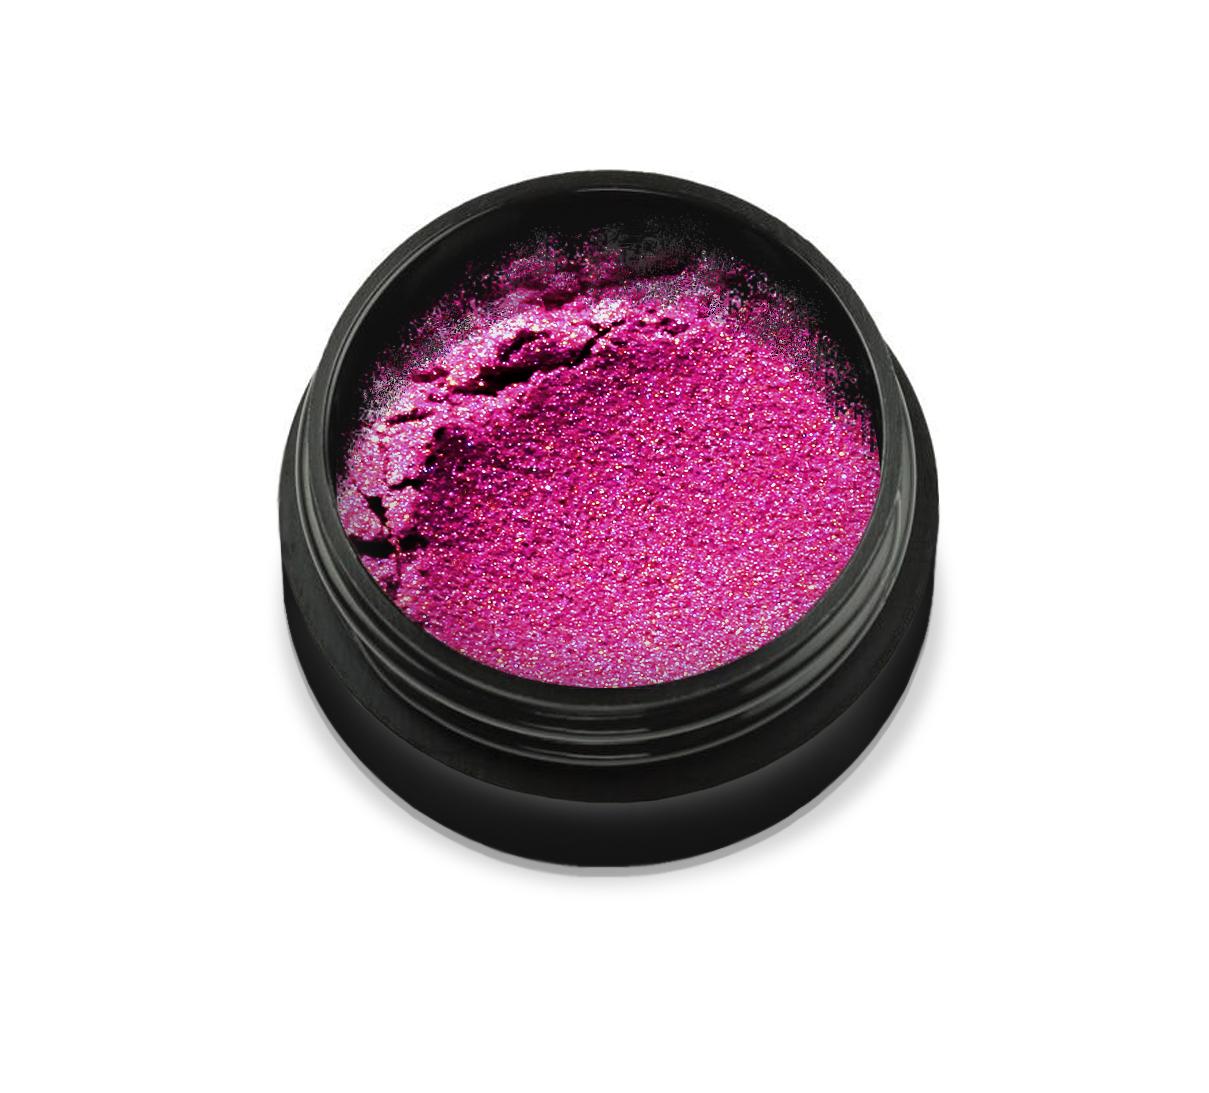 "6021 Pudra cu pigmenti 'Didier Lab"", rose red 2,5g/Pigment powder 'Didier Lab"", rose red"